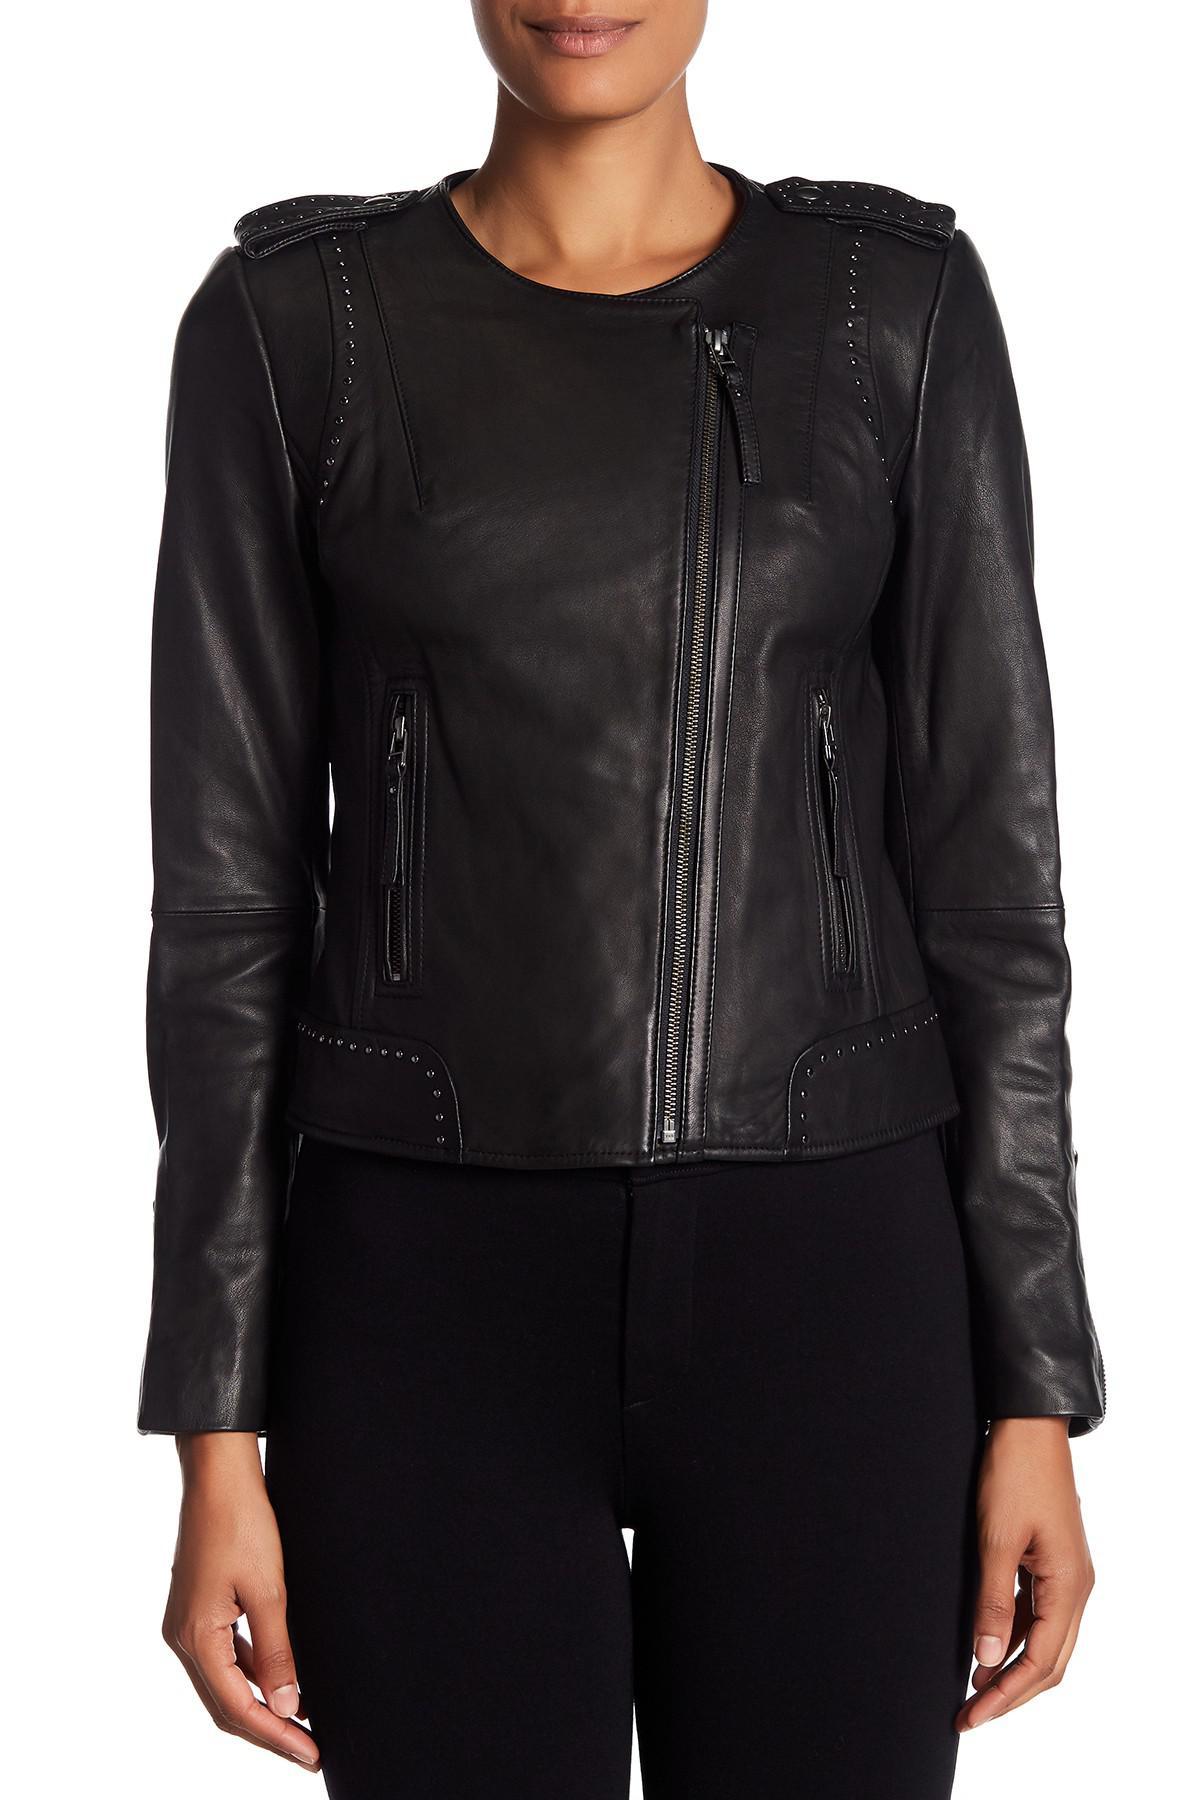 Lyst Joie Margolin Studded Genuine Leather Jacket In Black